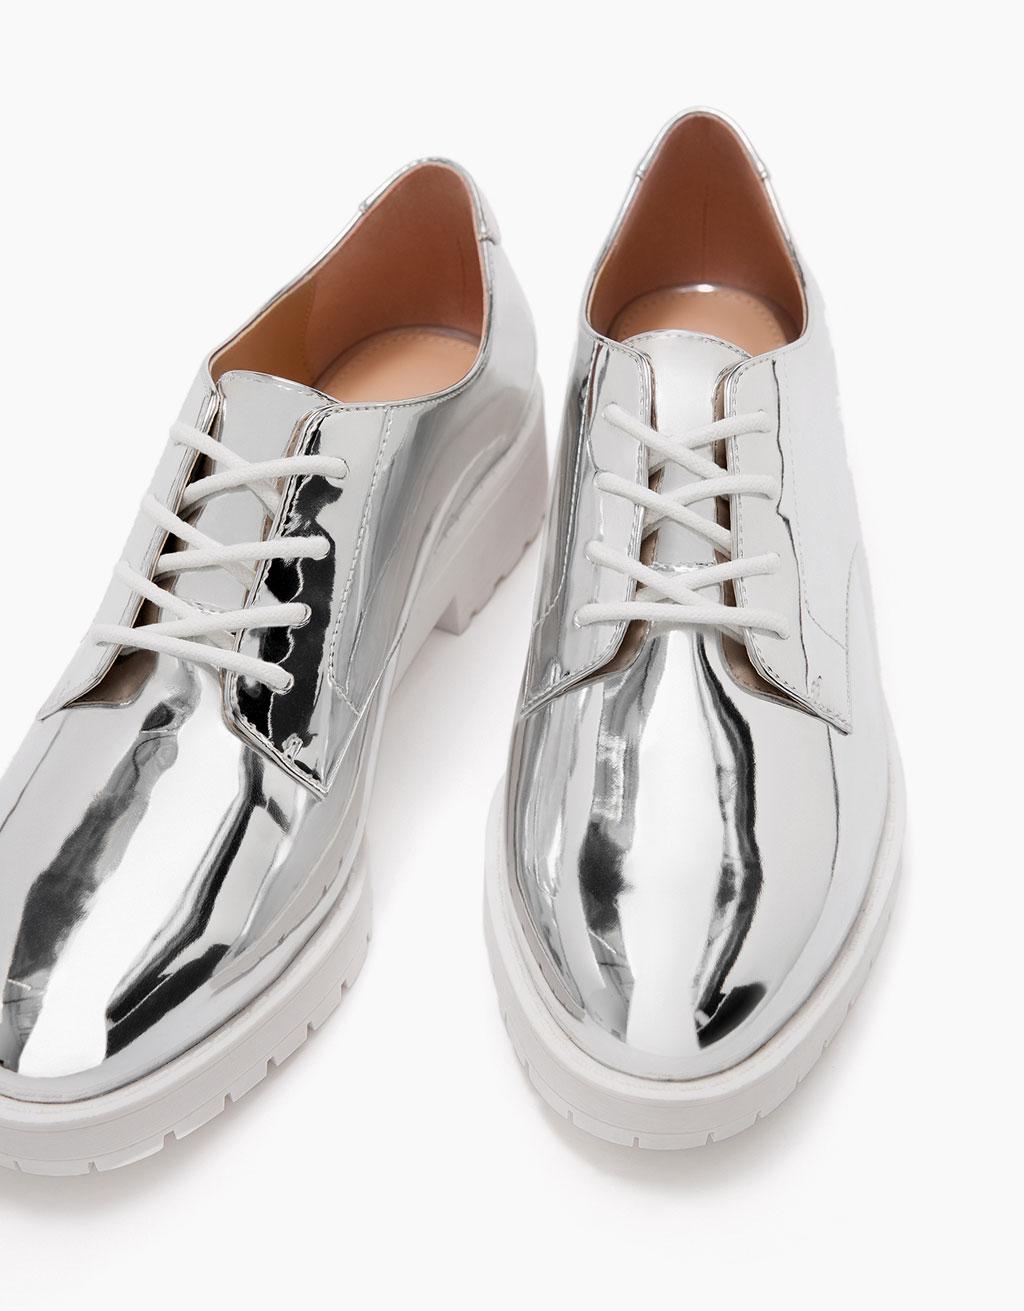 Flat metallic lace-up shoes